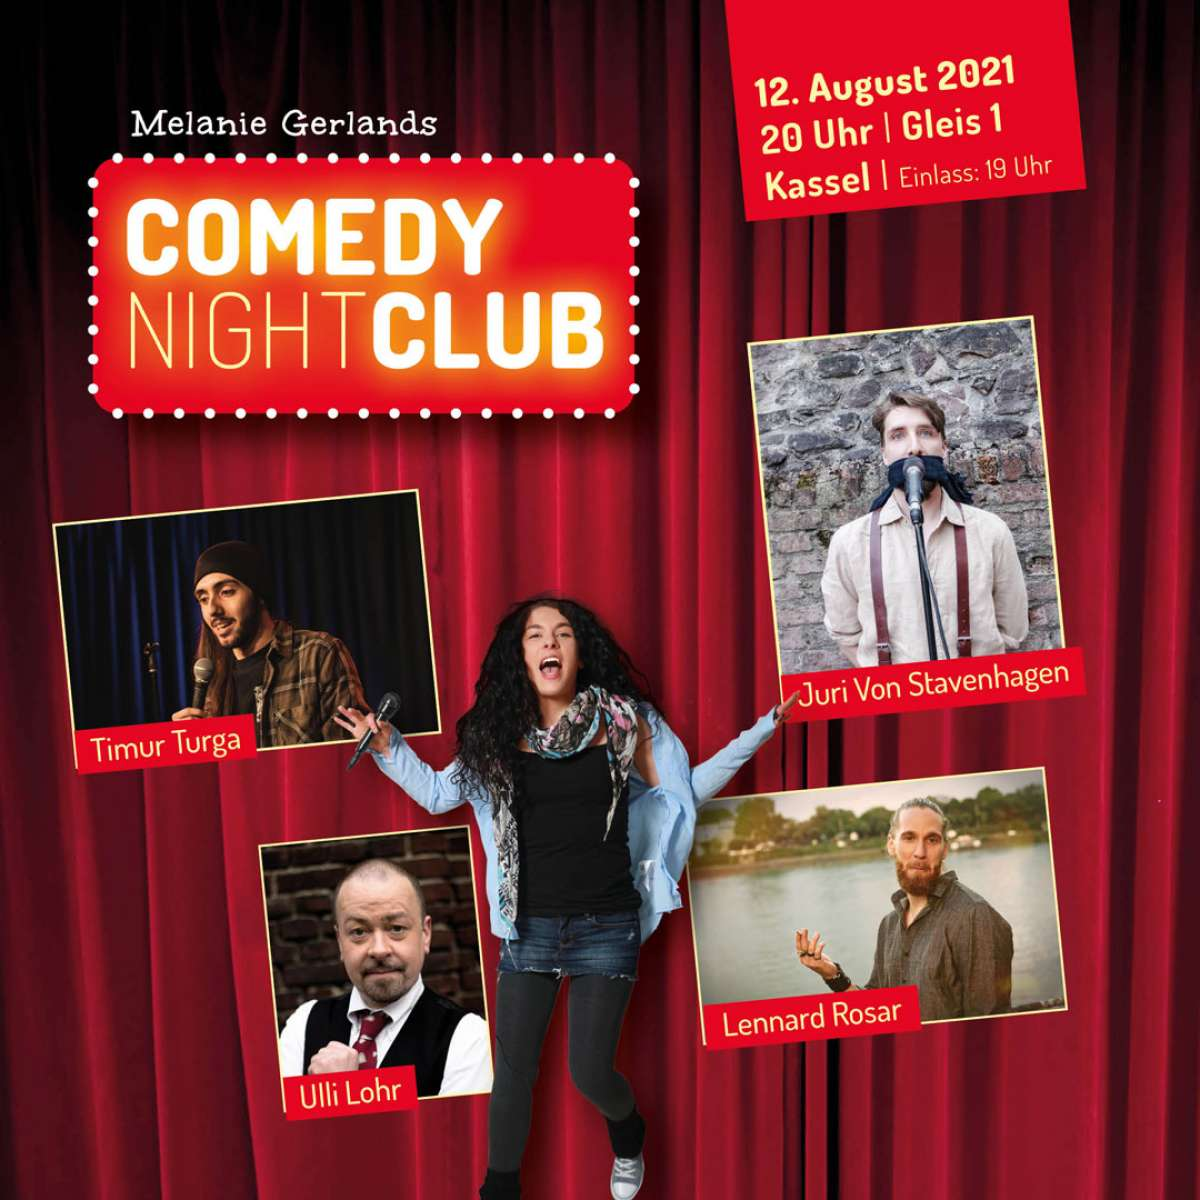 Melanie Gerlands Comedy Nightclub